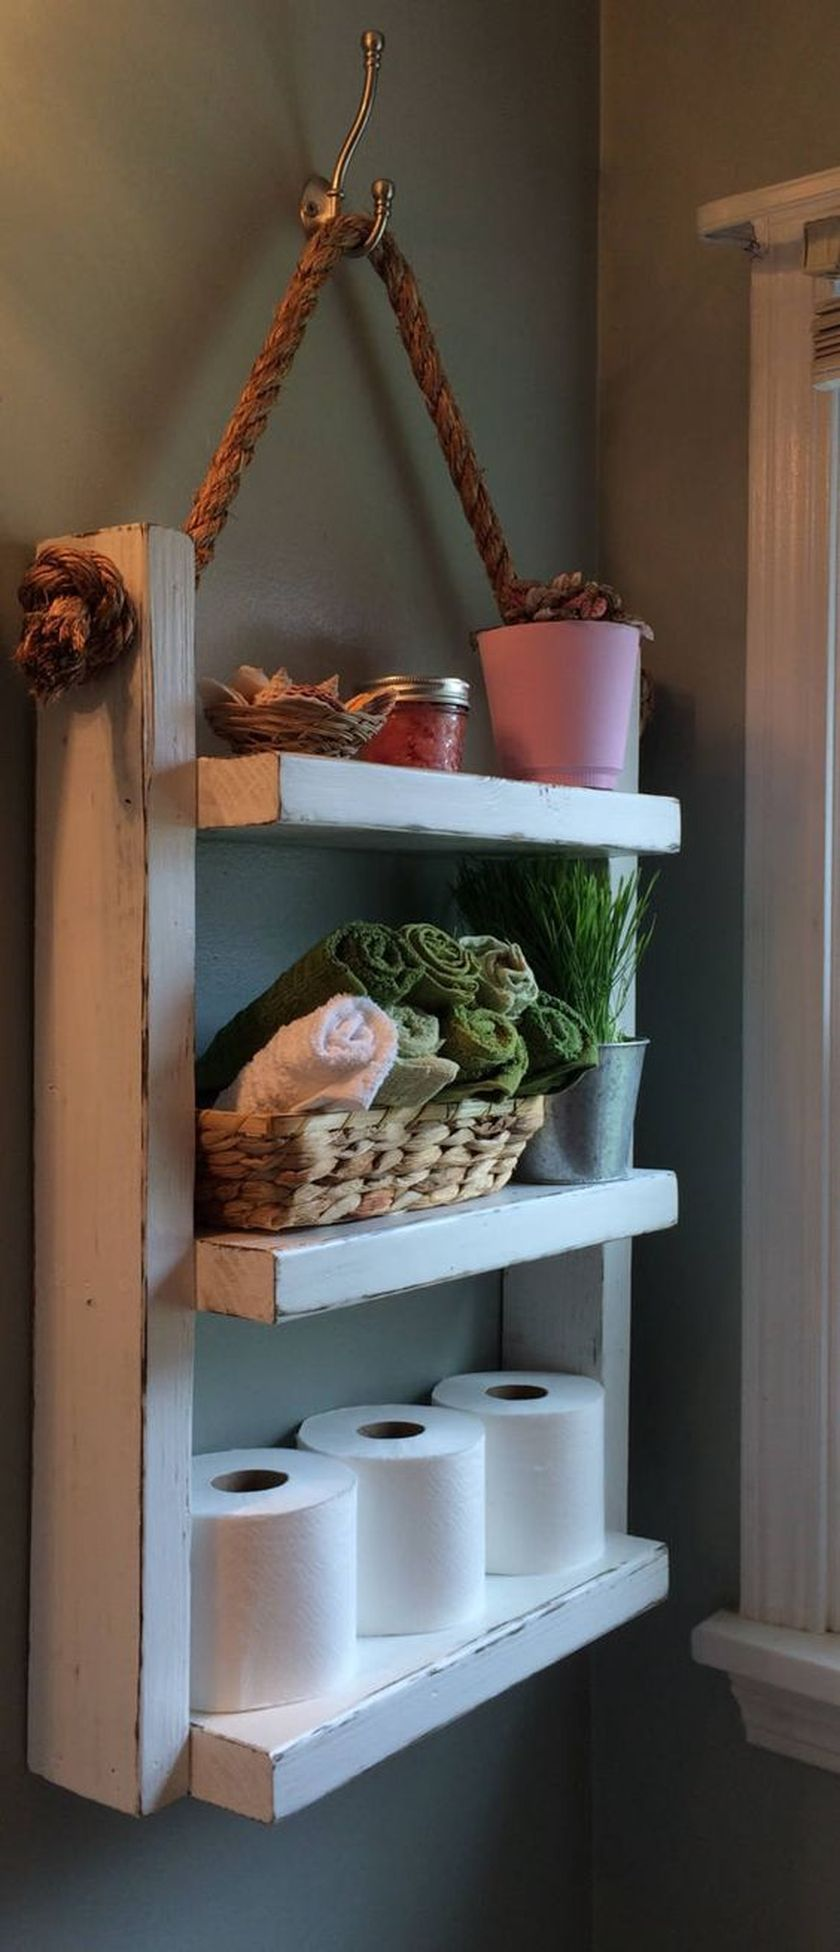 Rustic Country Bathroom Shelves Ideas, Country Bathroom Shelves